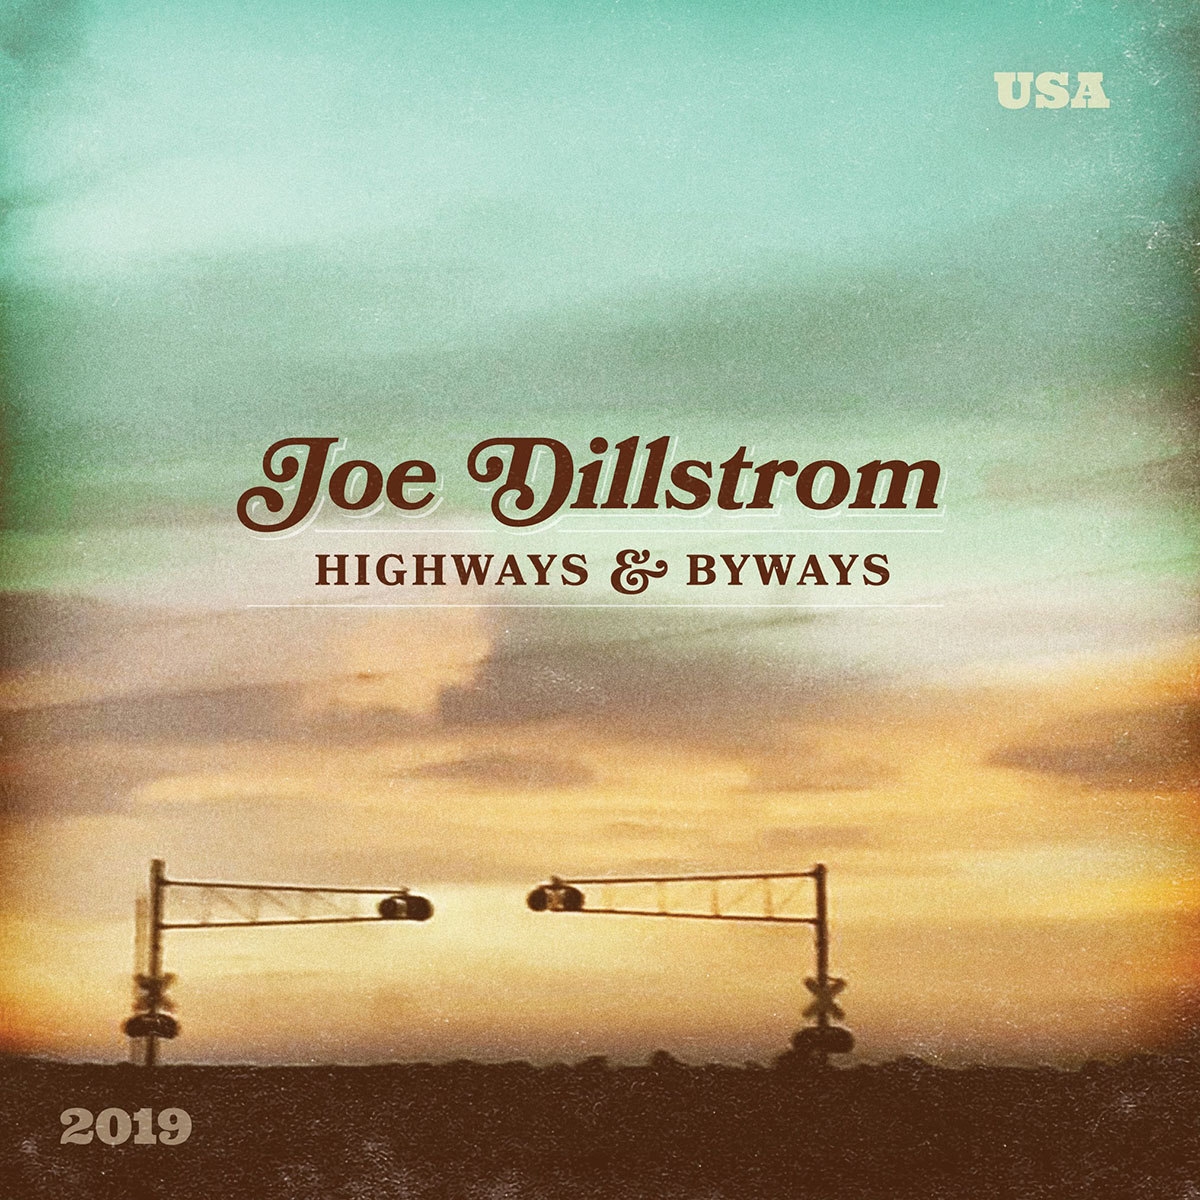 Joe Dillstrom: Highways & Byways